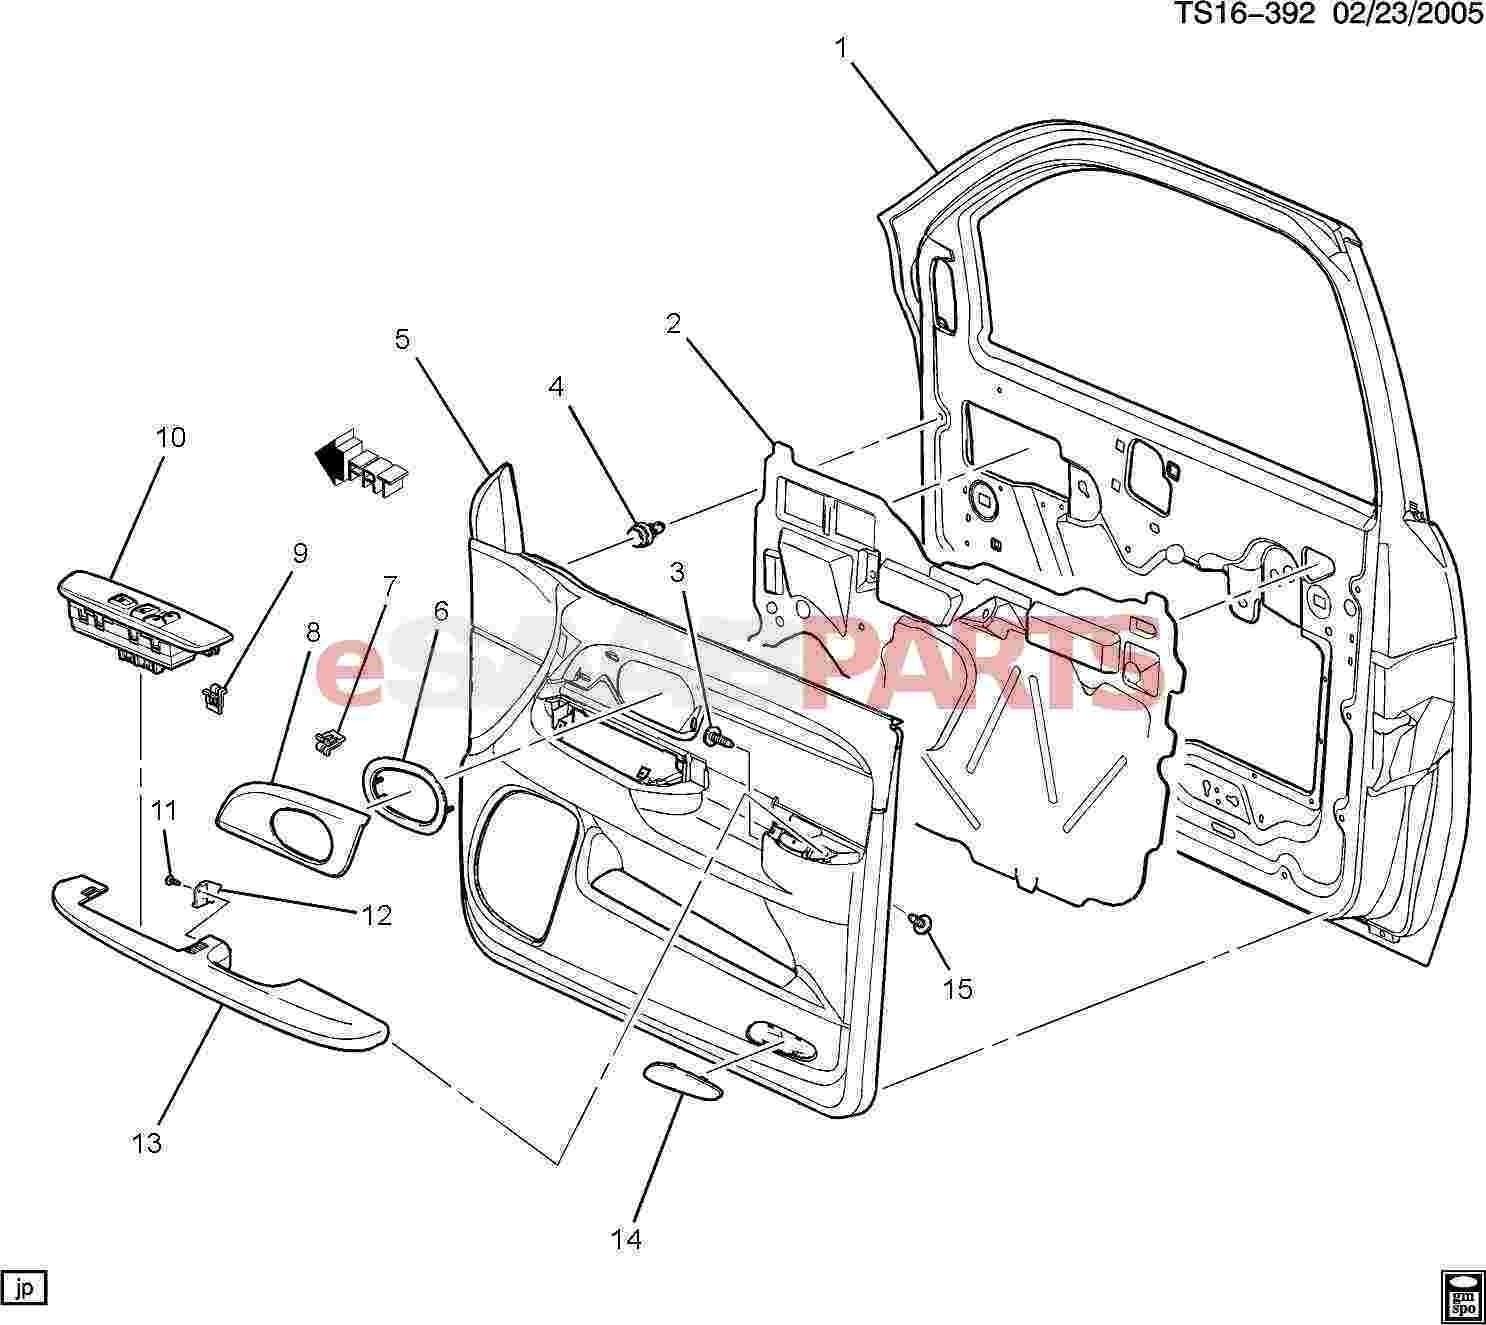 Vehicle Suspension Diagram Diagram Parts Under A Car Diagram Car ...